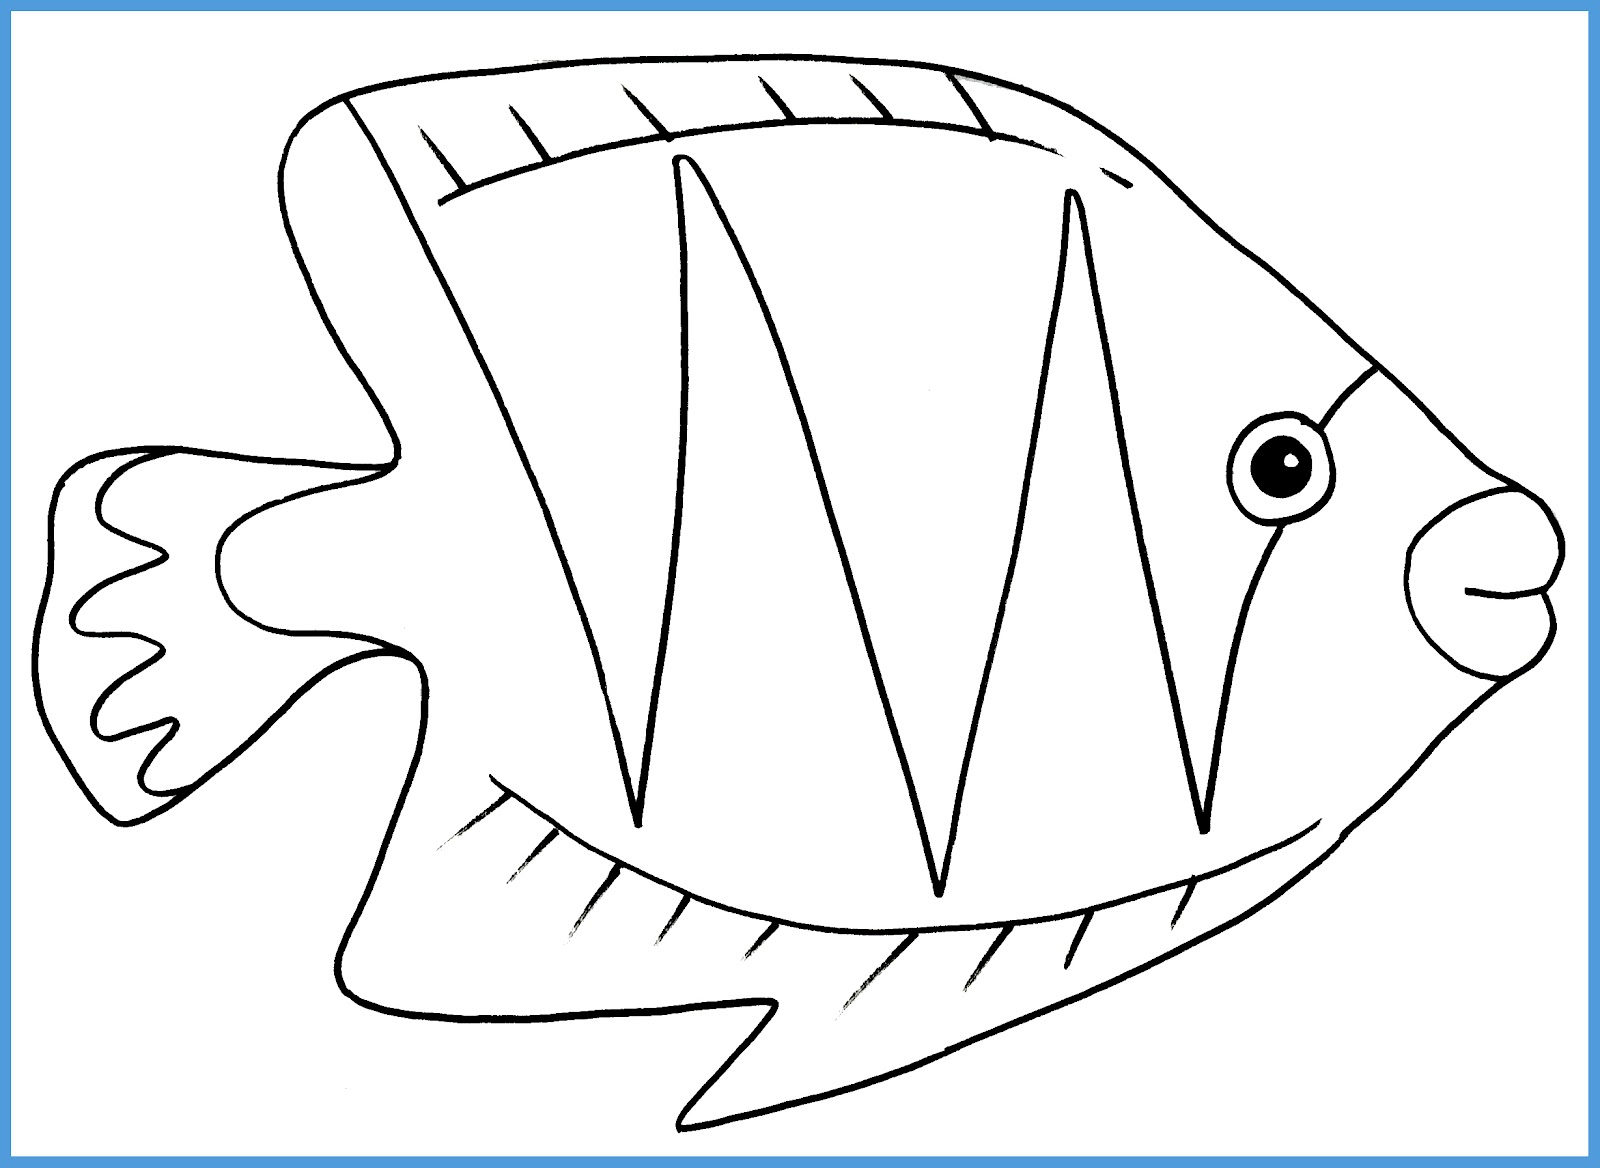 Manualidades con tema veraniego murciamar for Papel para dibujar